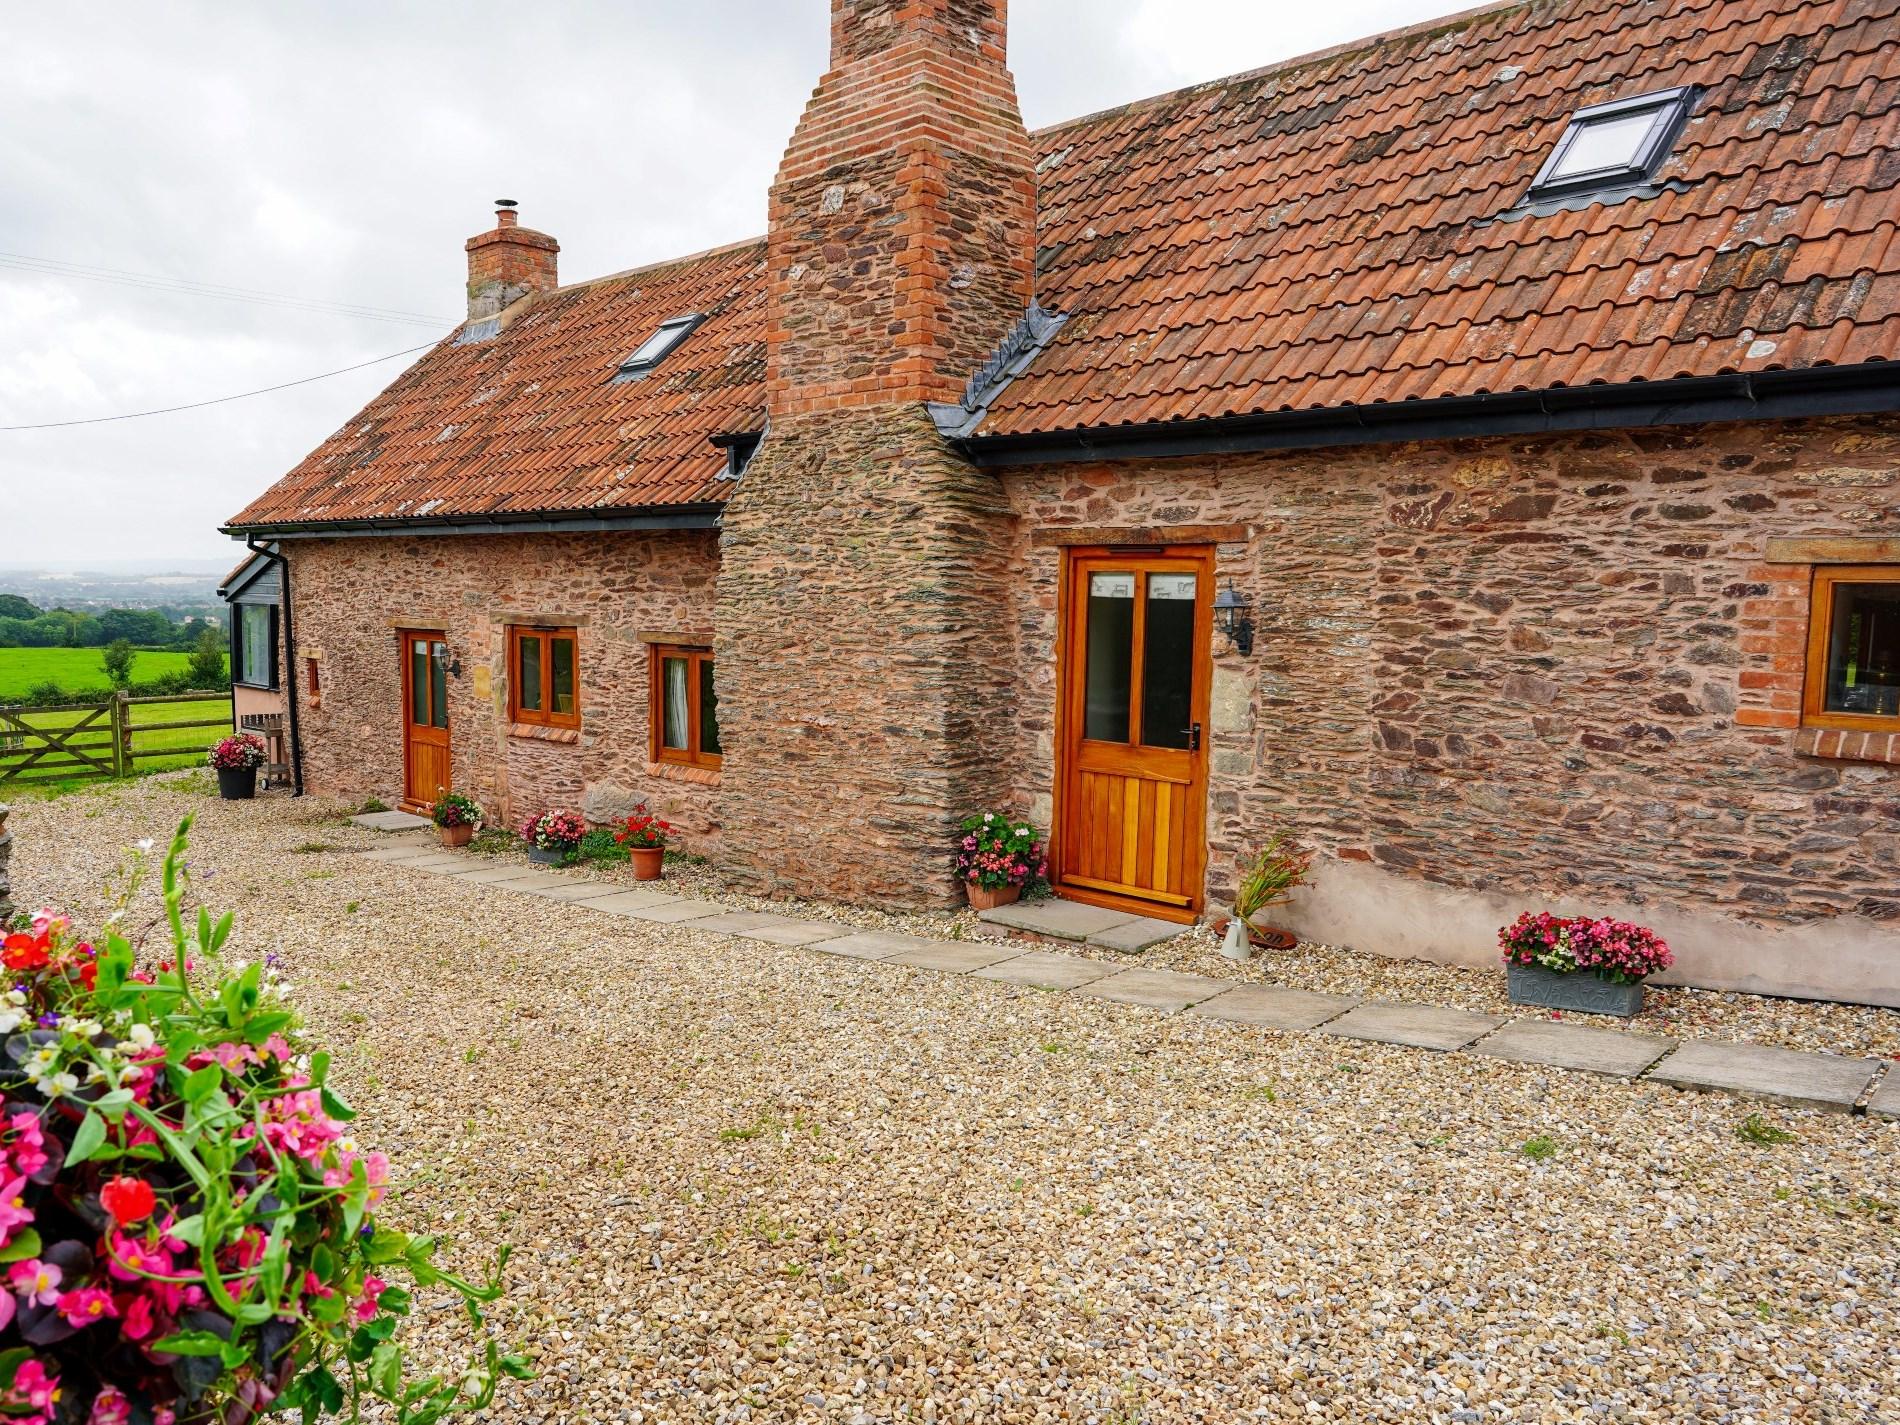 1 Bedroom Cottage in Somerset, Dorset and Somerset